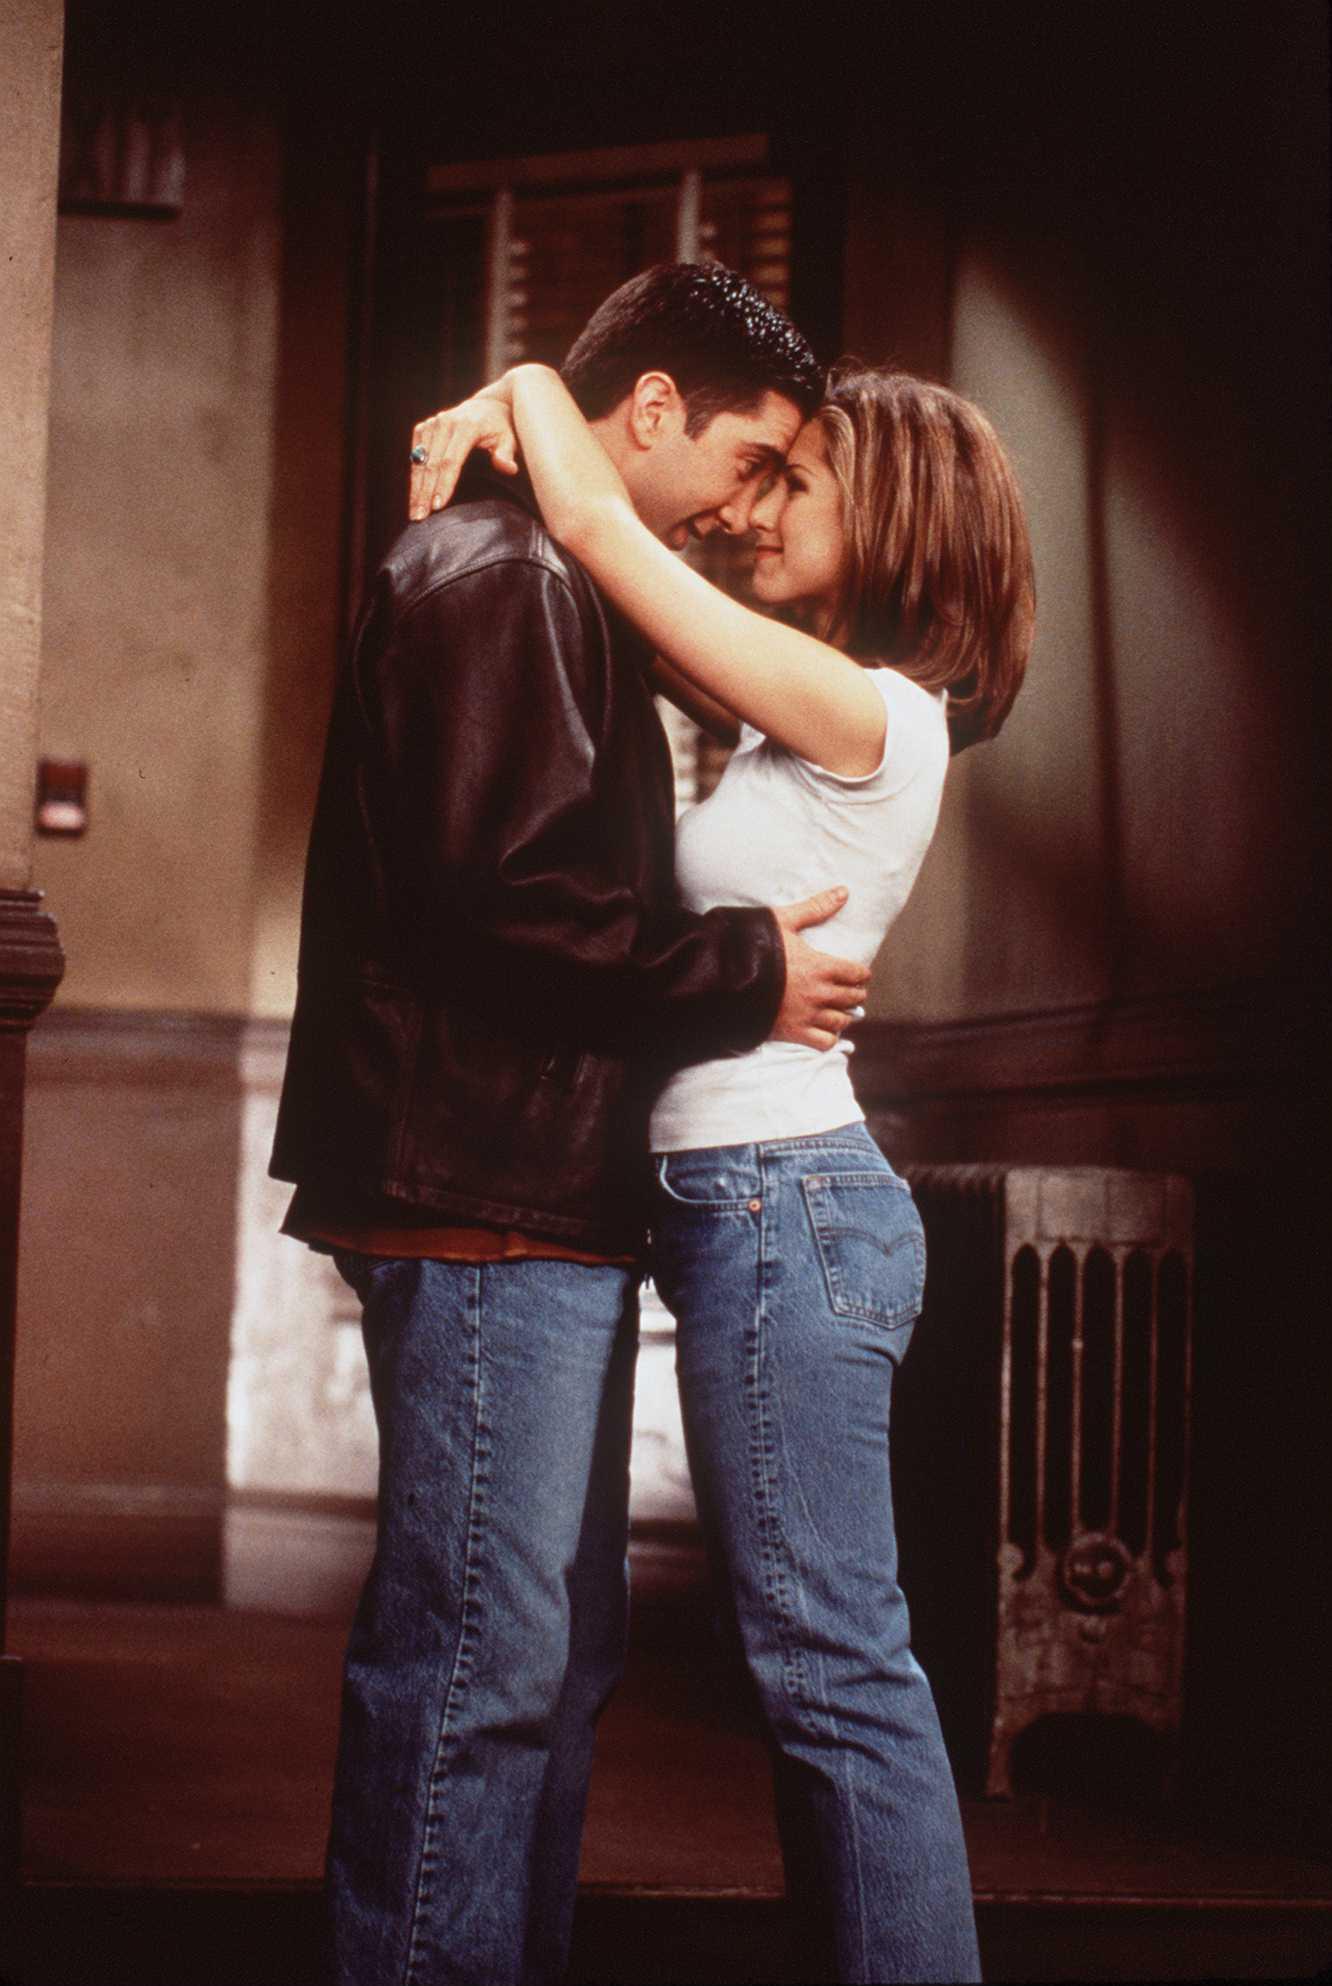 Los personajes de Ross y Rachel de Friends/Foto: Getty